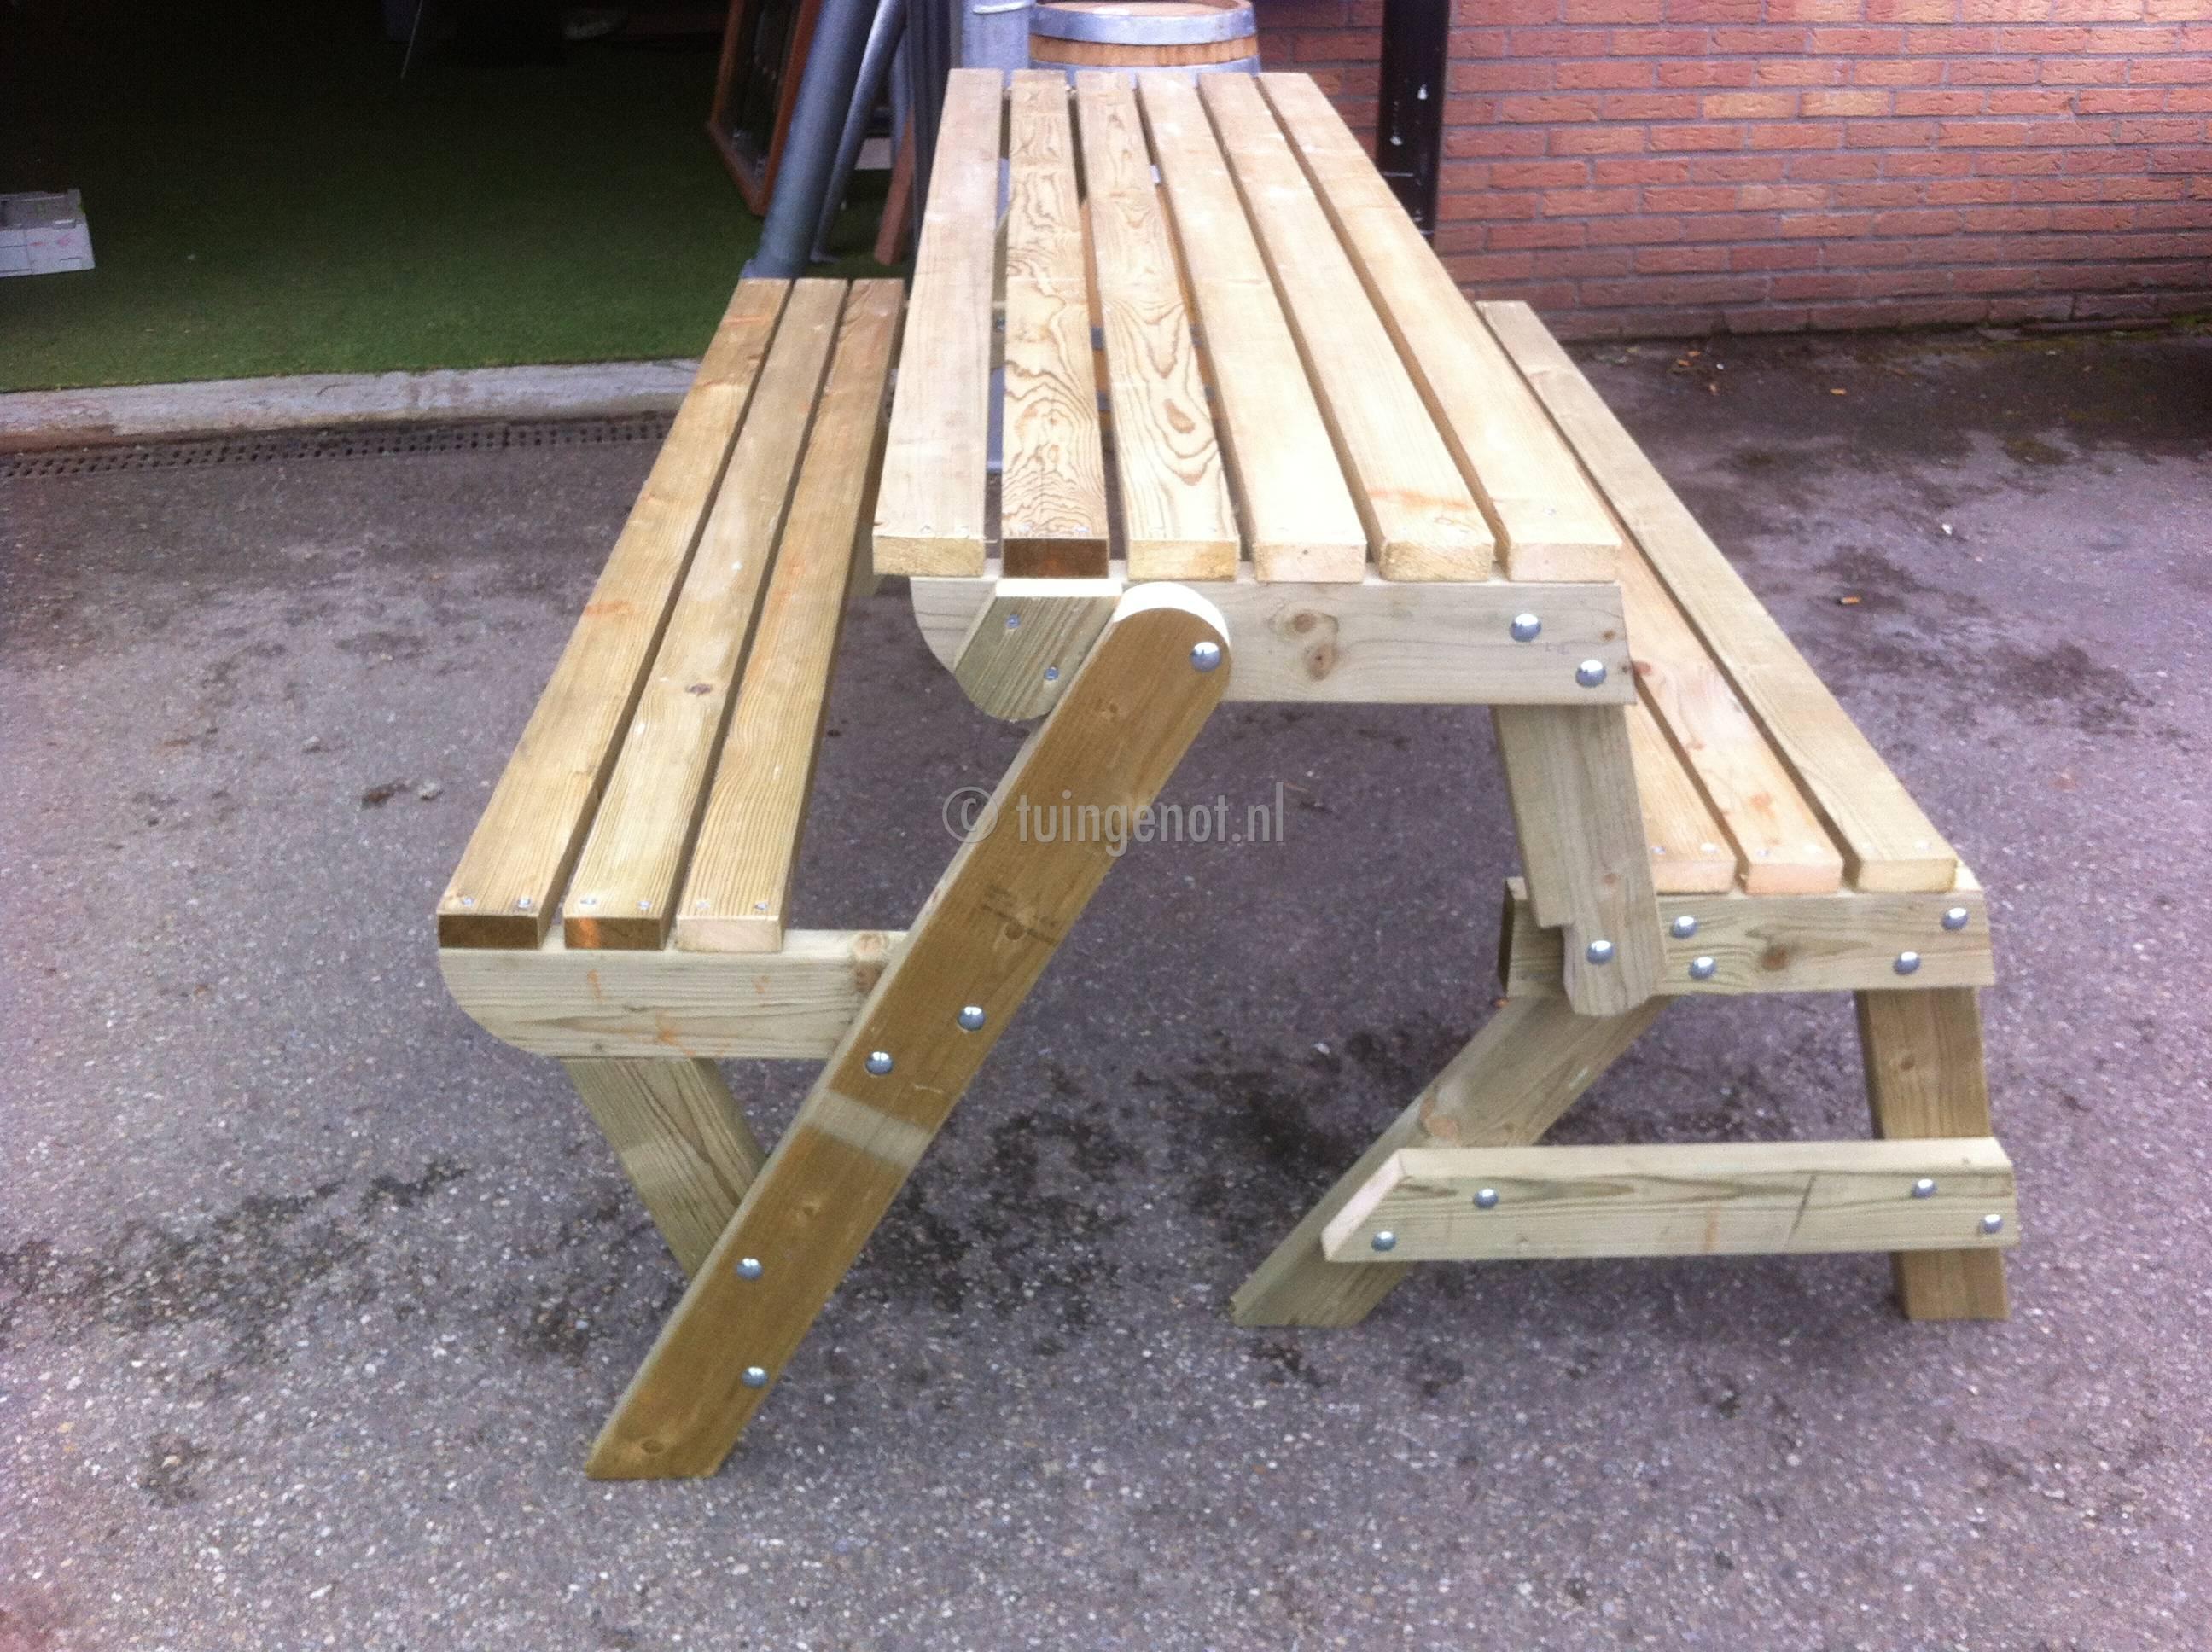 Tuingenot  95 multifunctionele ombouwbare picknicktafel